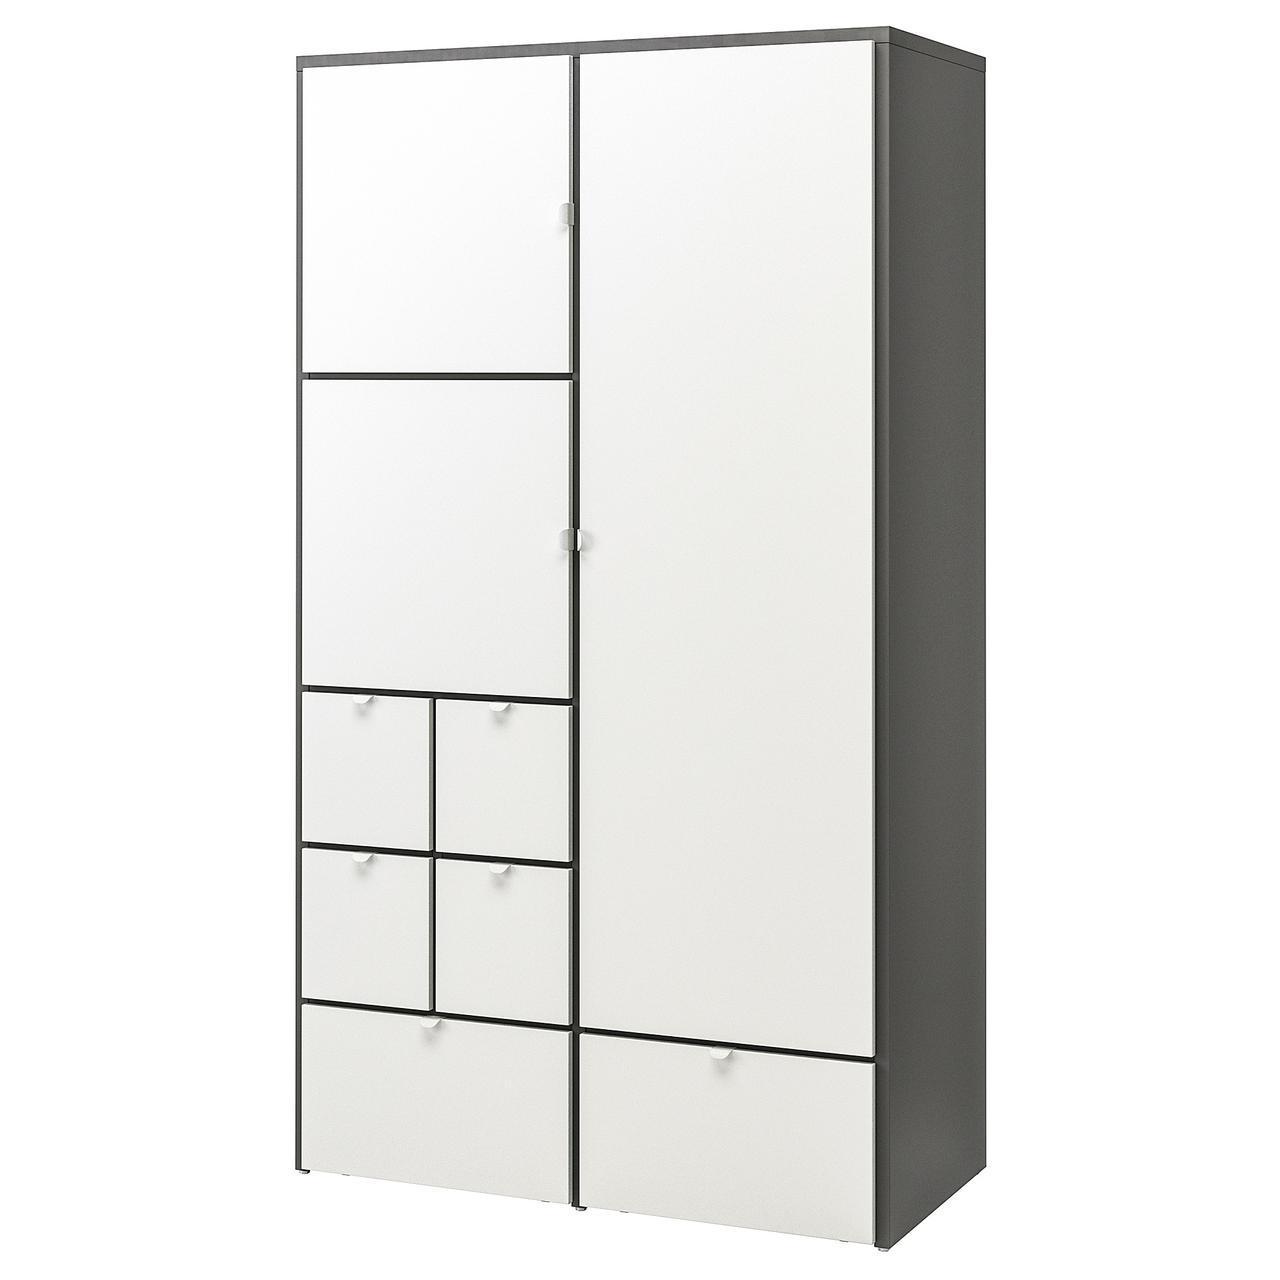 IKEA VISTHUS Шкаф, серый с  белым  (503.476.16)